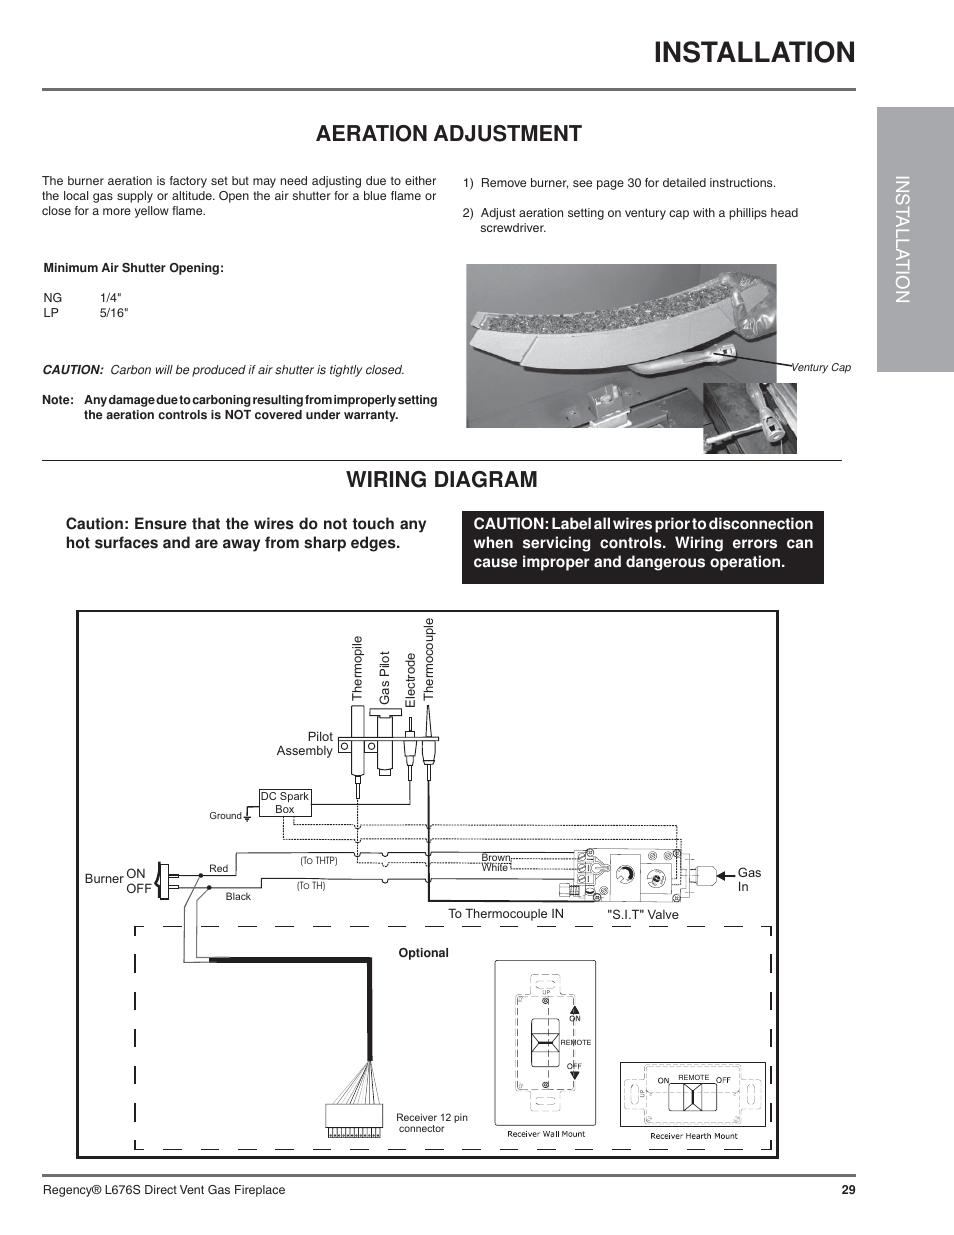 medium resolution of installation wiring diagram aeration adjustment inst alla tion regency sunrise gas fireplace